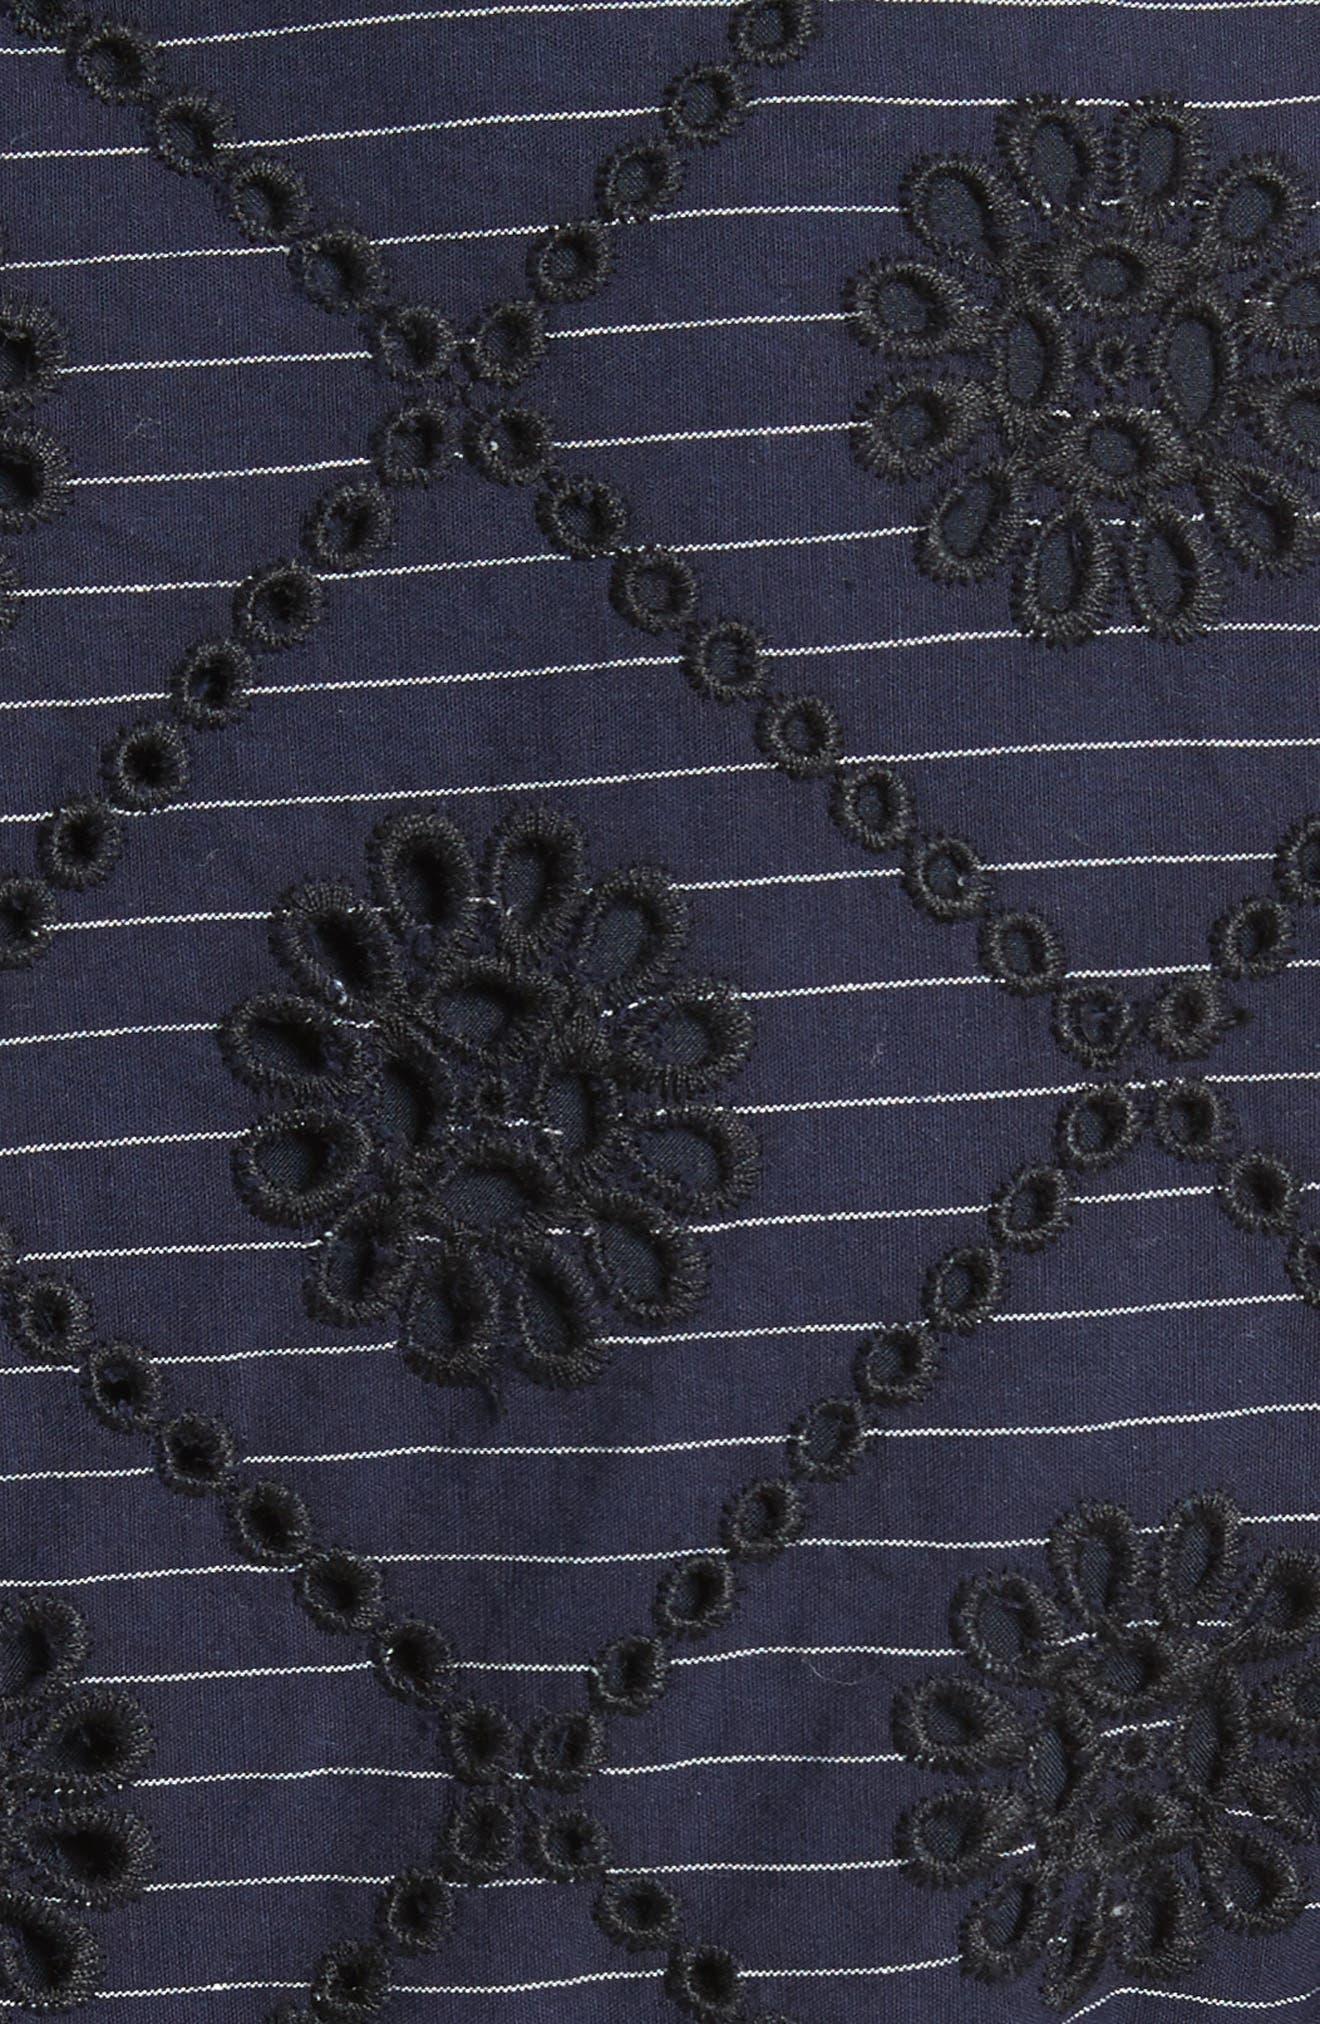 Ruffle Sleeve Eyelet Minidress,                             Alternate thumbnail 5, color,                             410